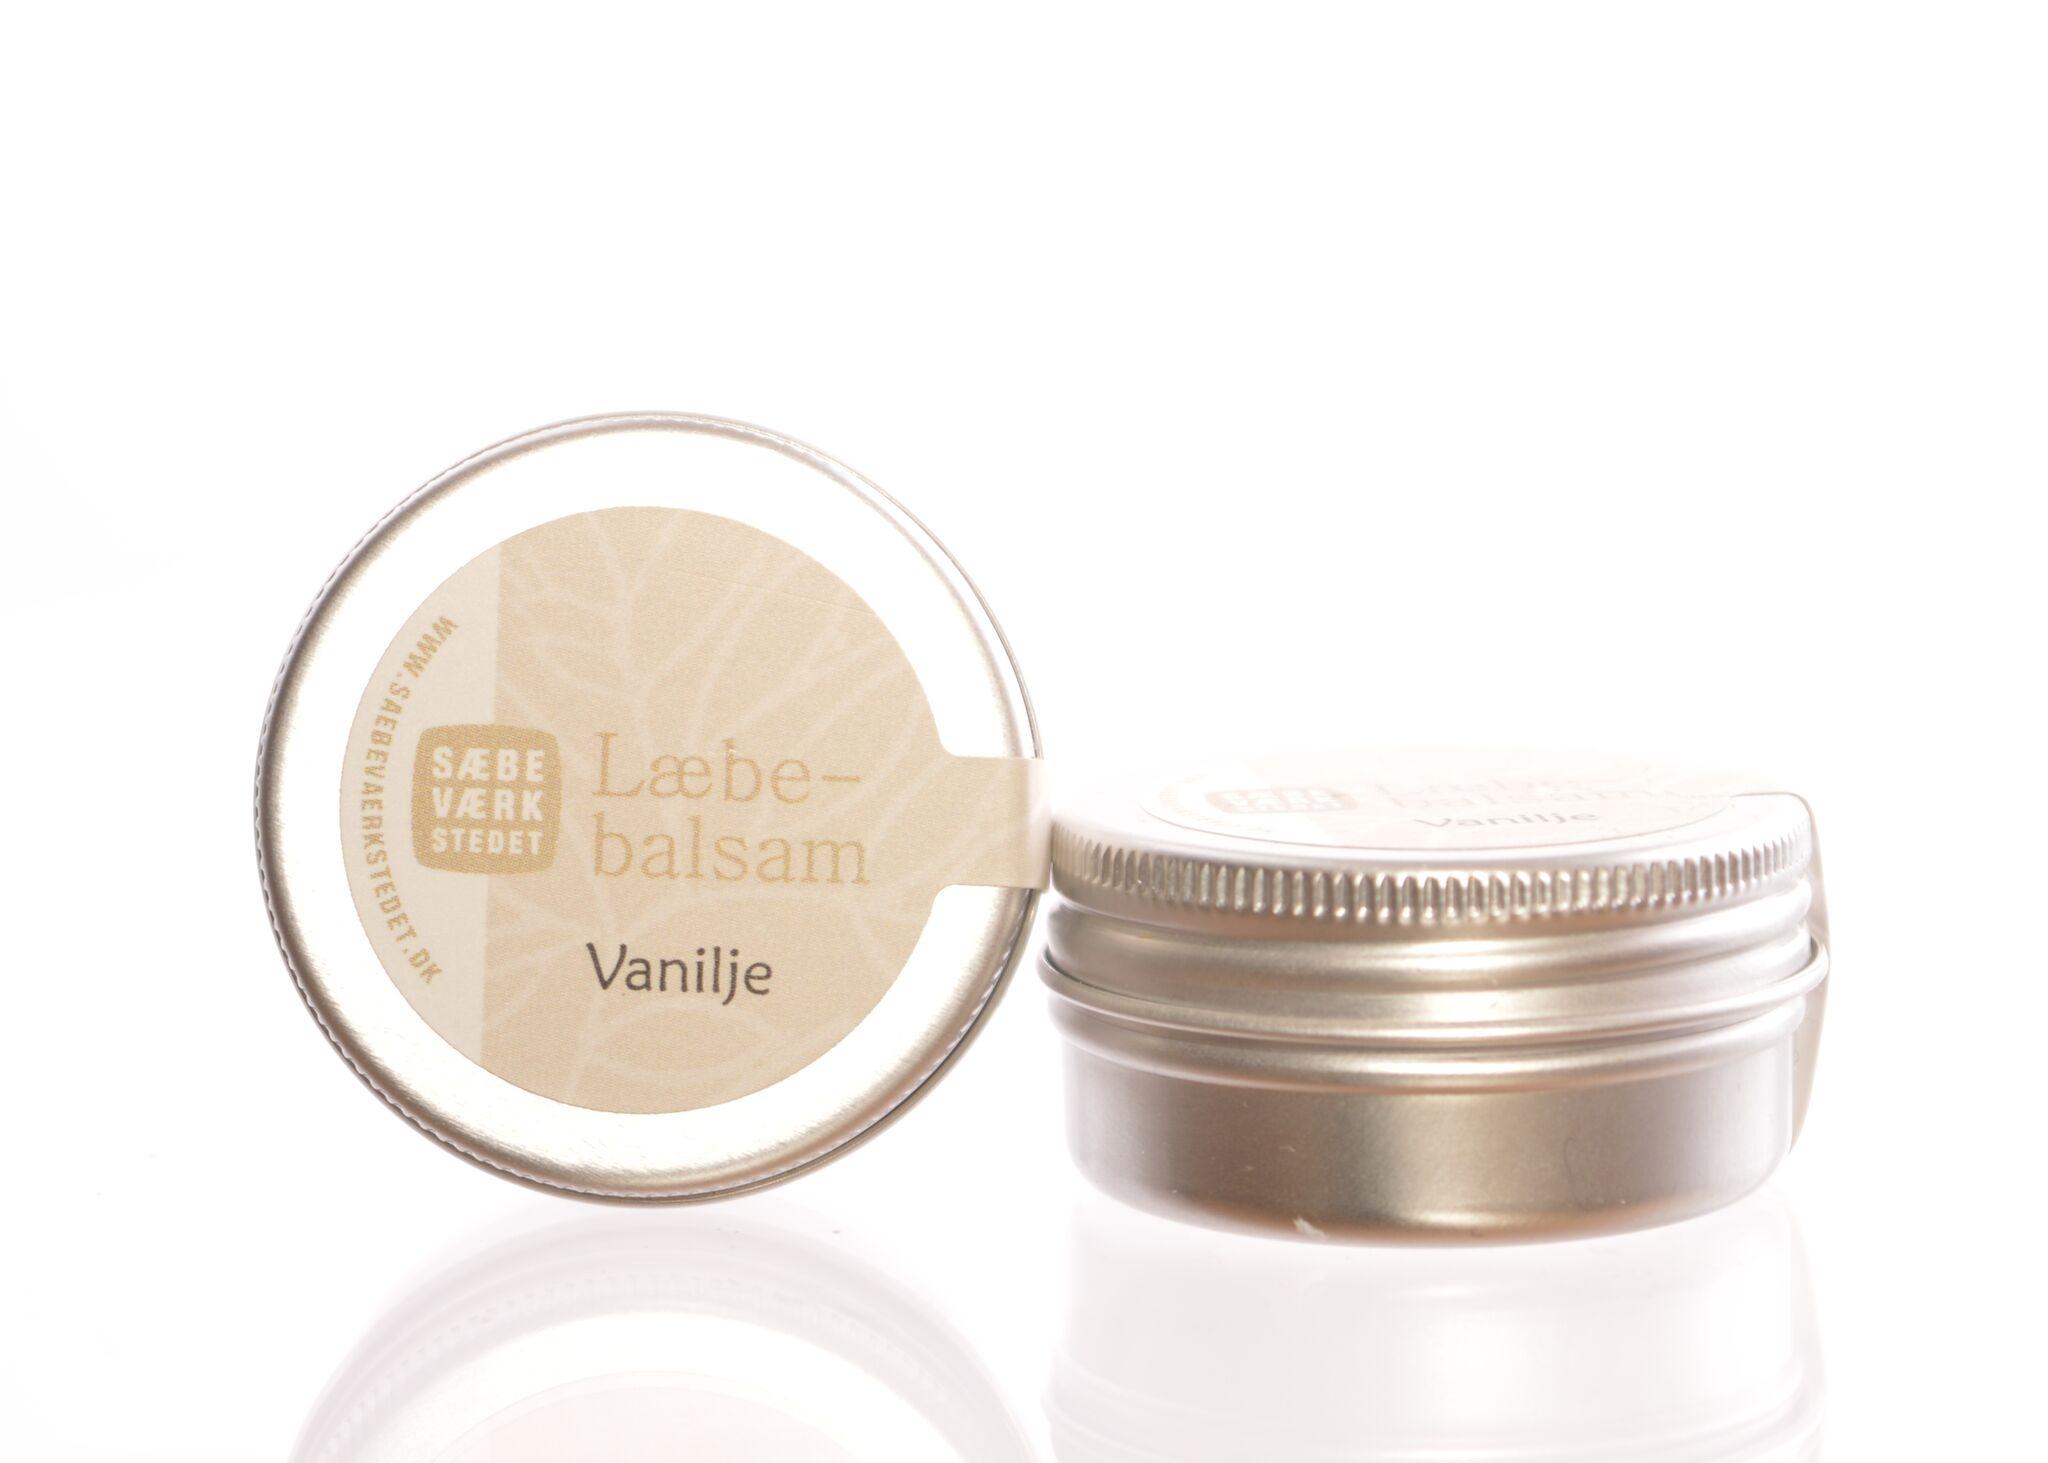 Læbebalsam med vanille - 14 g